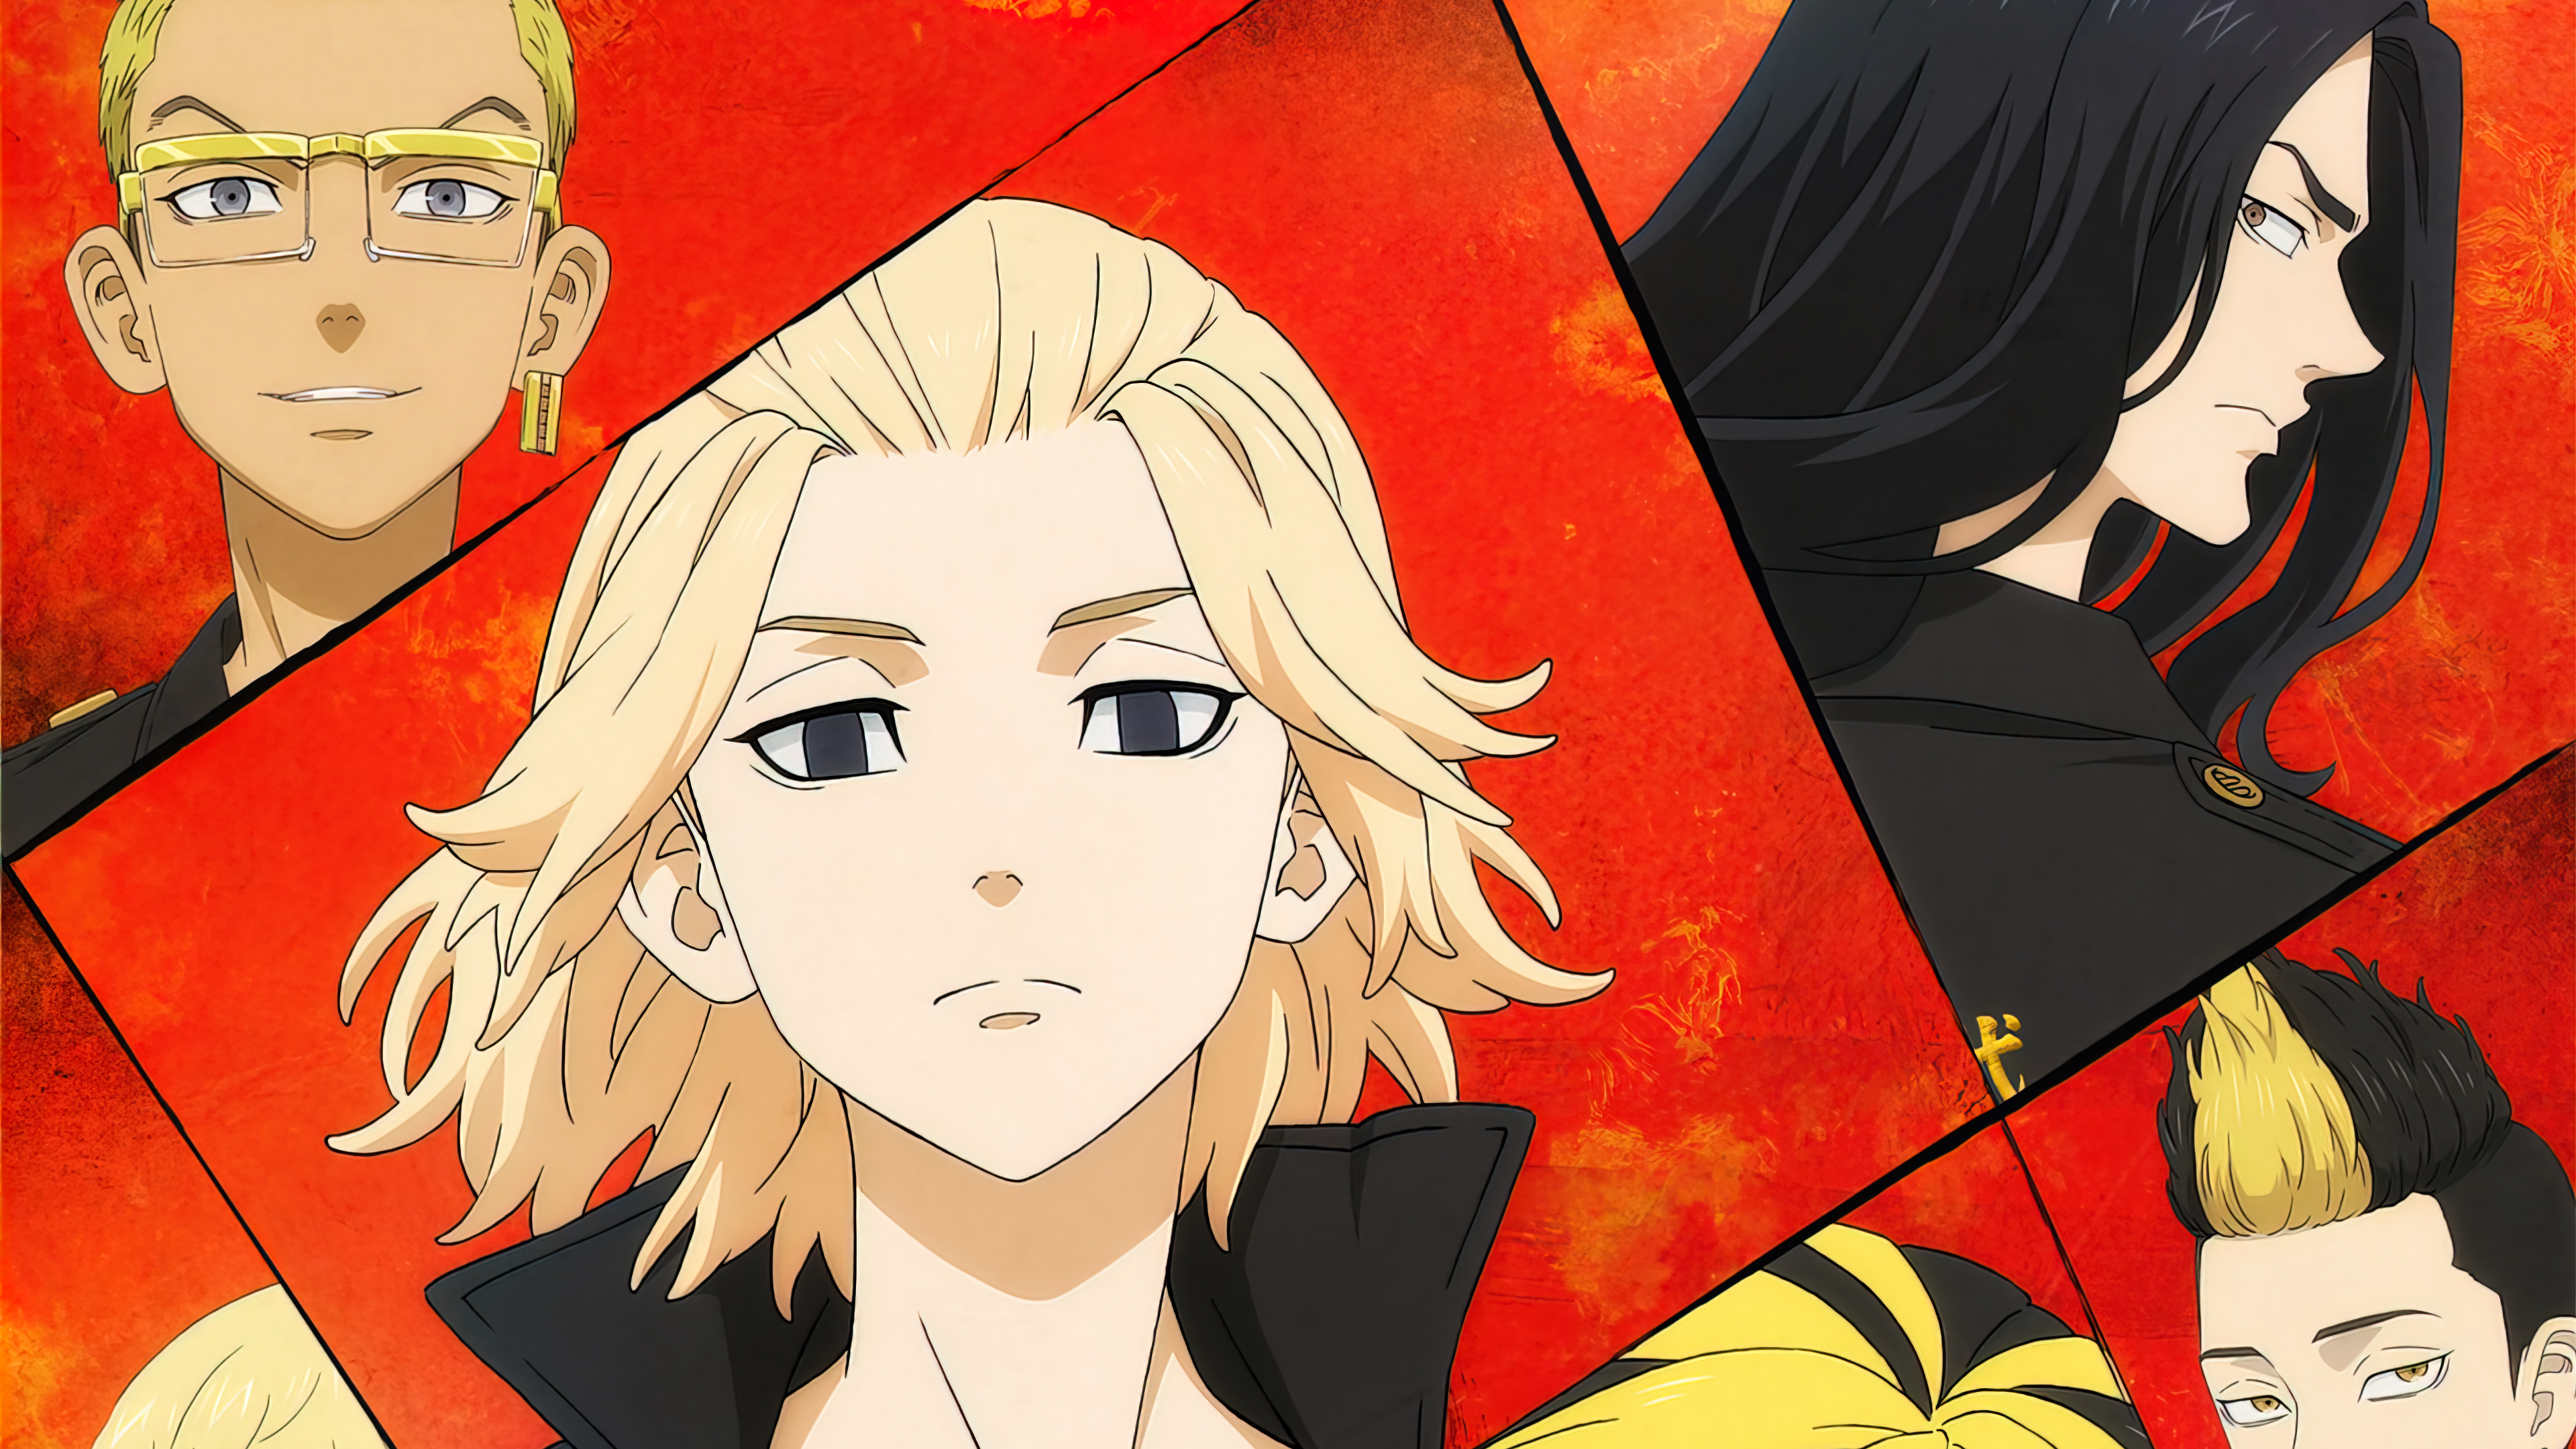 Fondos de pantalla Anime Personajes de Tokyo Revengers